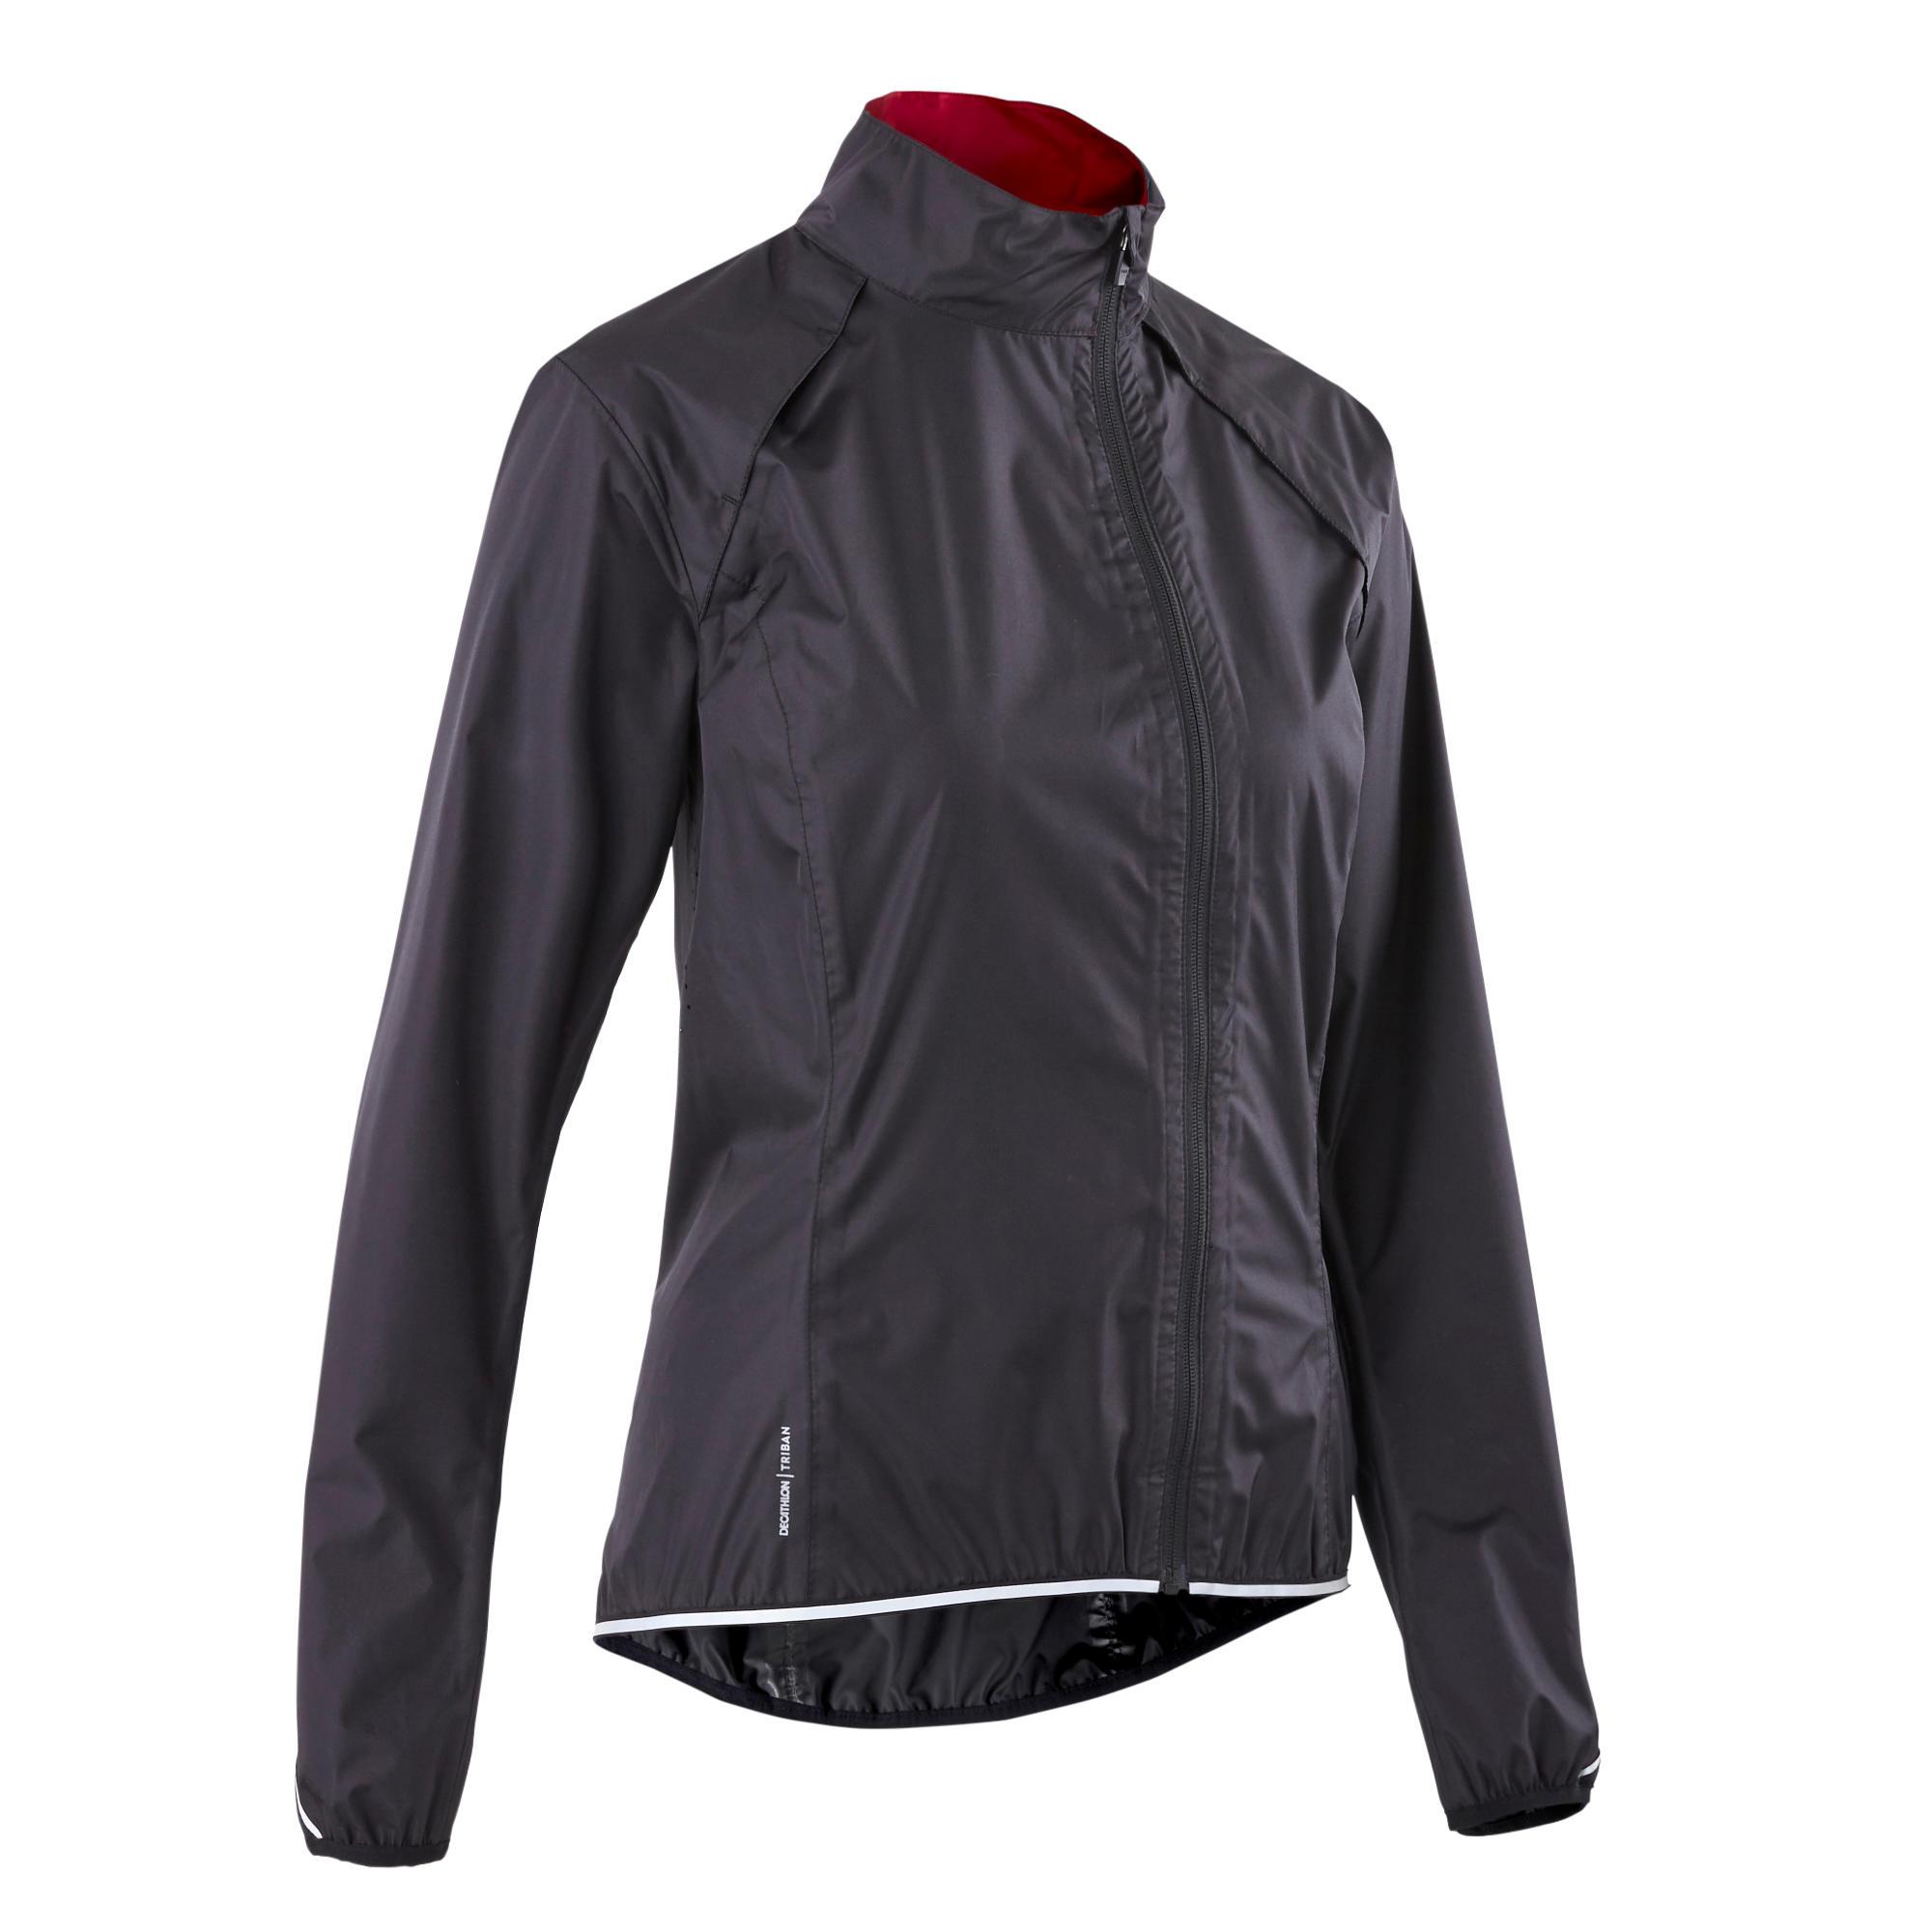 Jachetă Ploaie 500 Negru